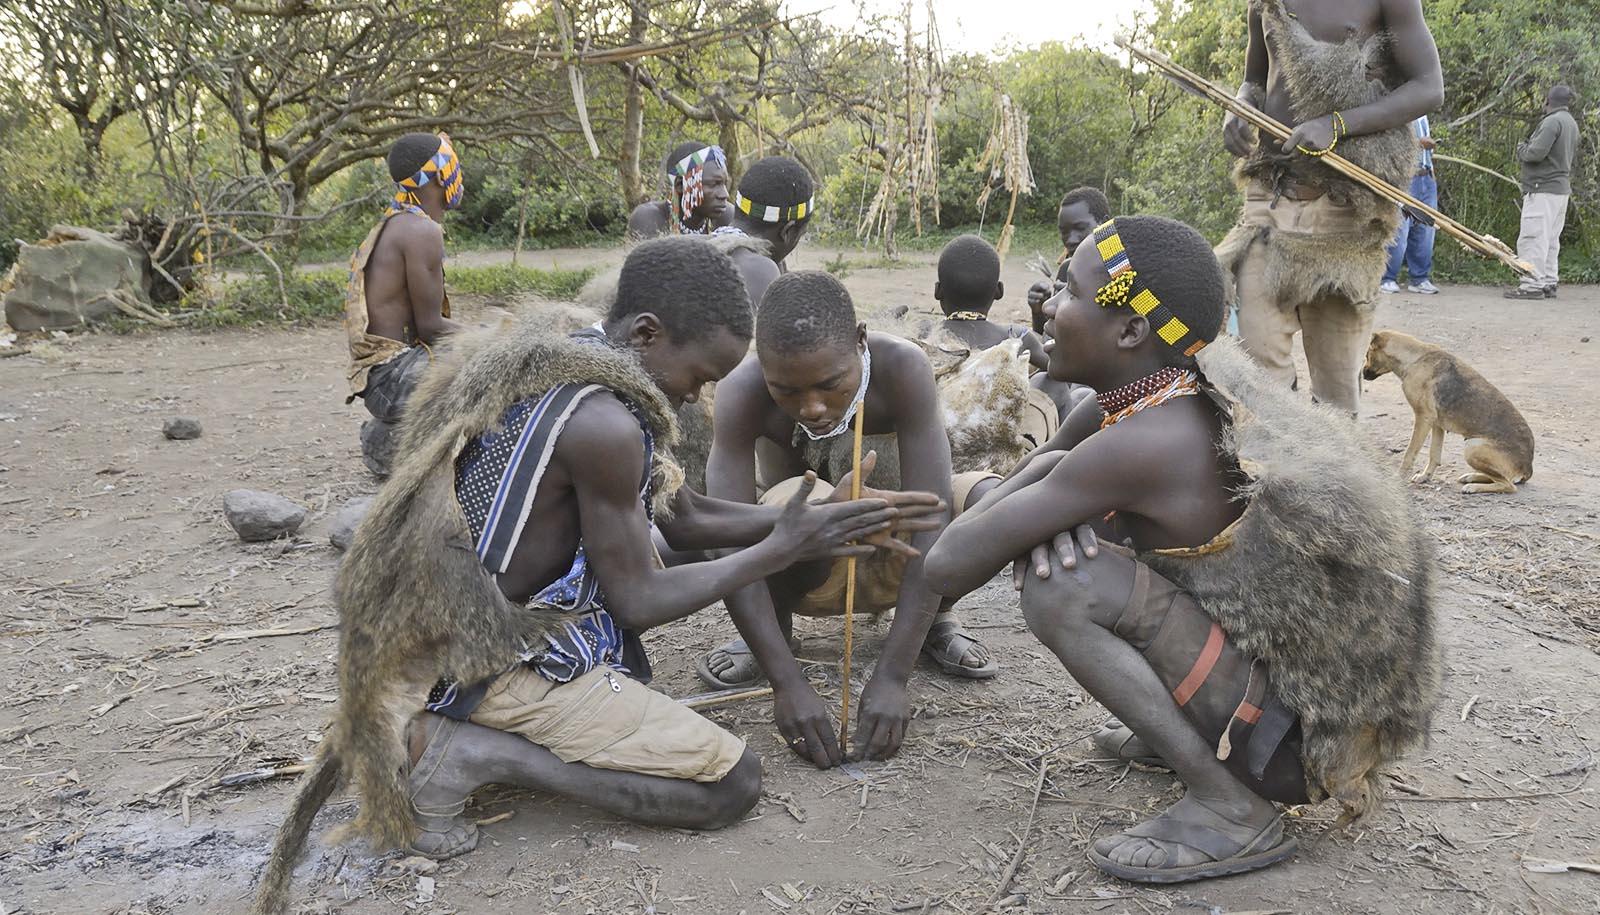 Hadza boys build a fire